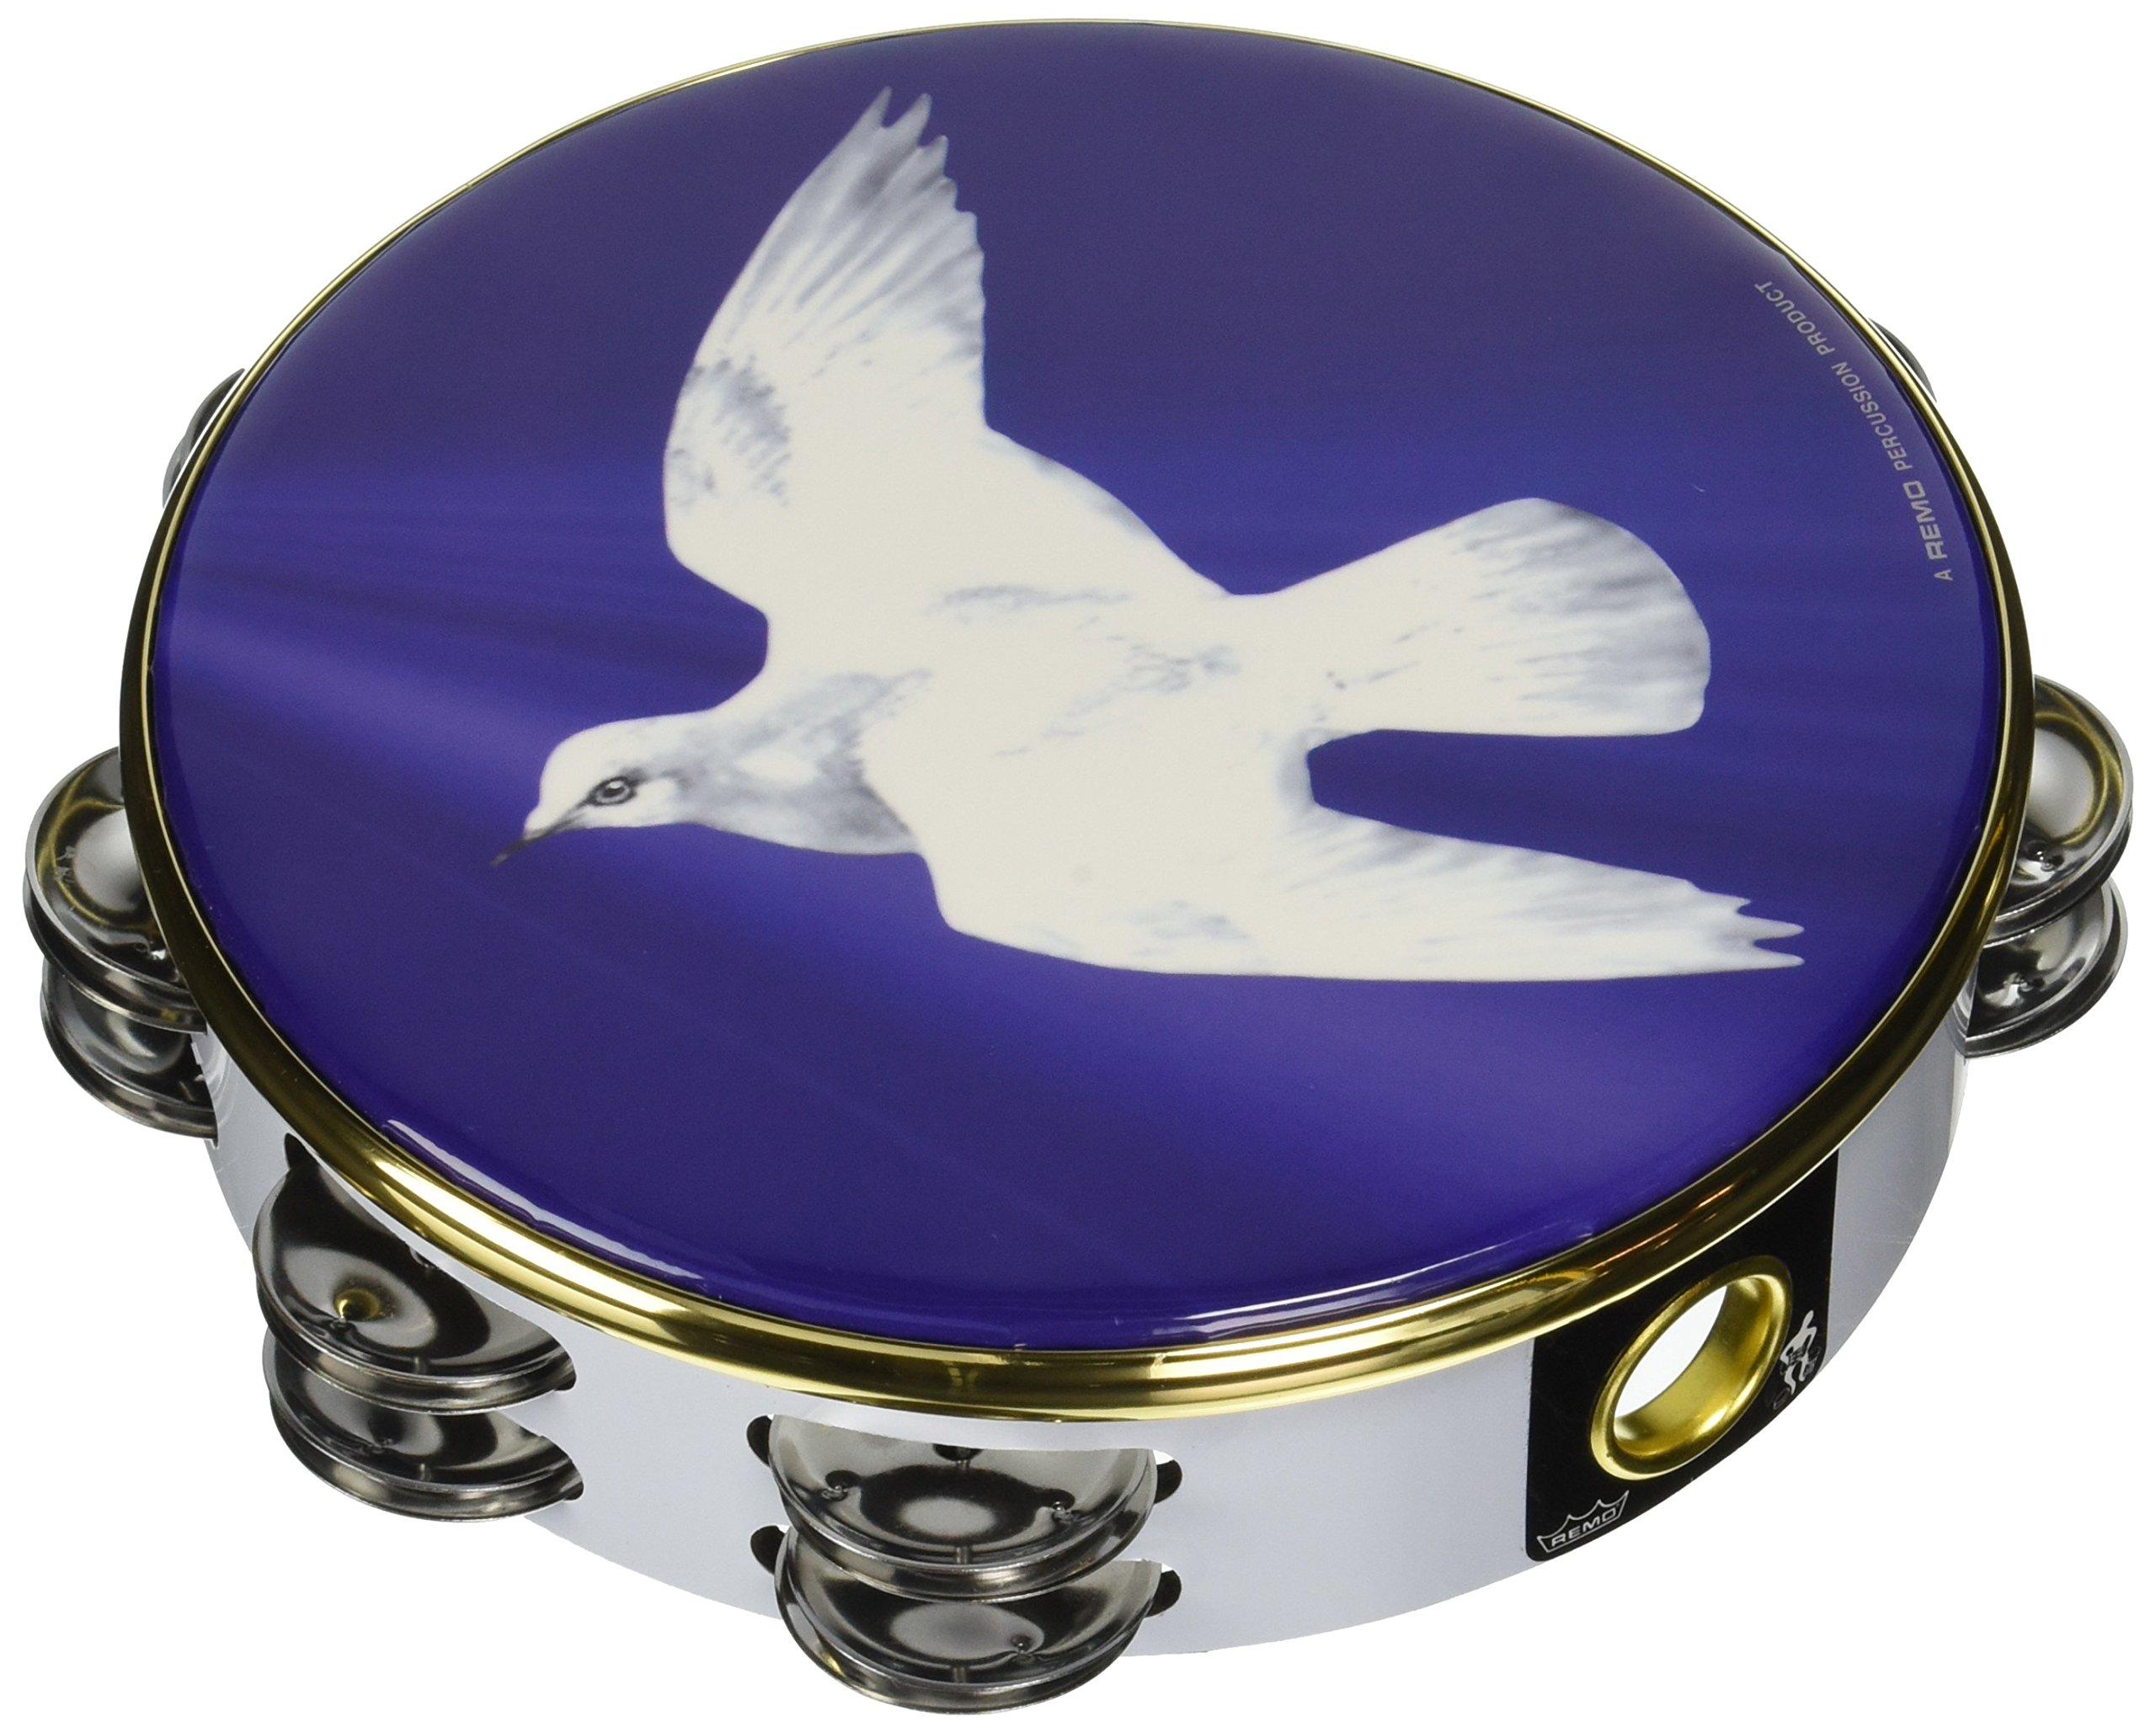 Remo Tambourine, 8'' Diameter, 8 Pairs Jingles x 2 Rows, 'Religious Dove' Graphic by Remo